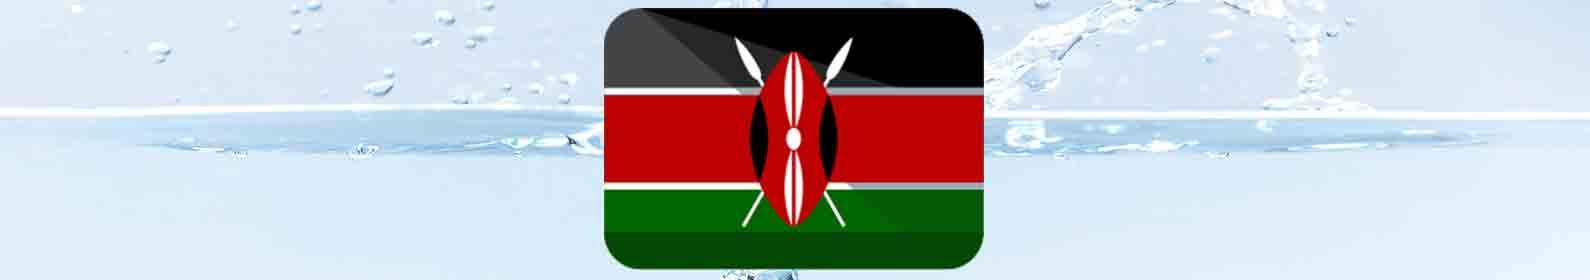 water-treatment-kenya.jpg